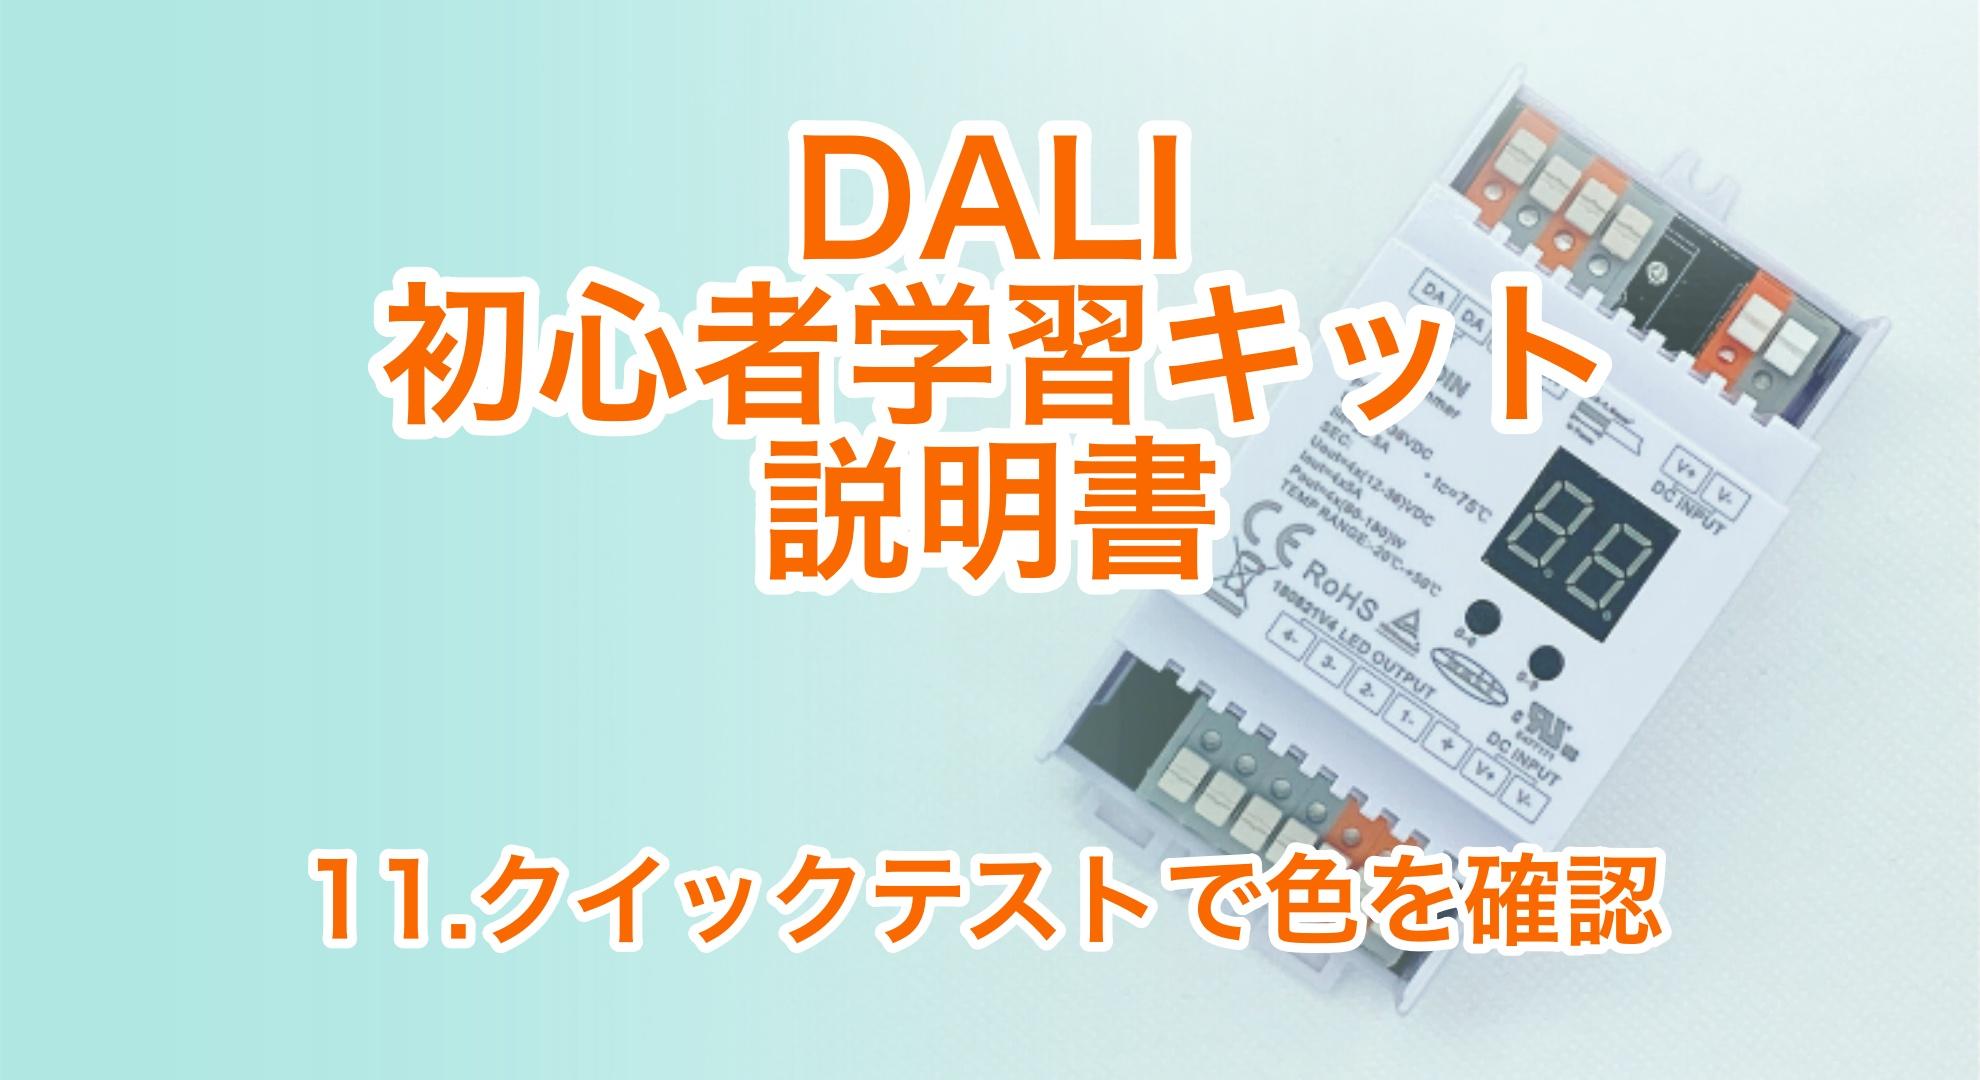 DALI初心者学習キット説明書 11.クイックテストで色を確認